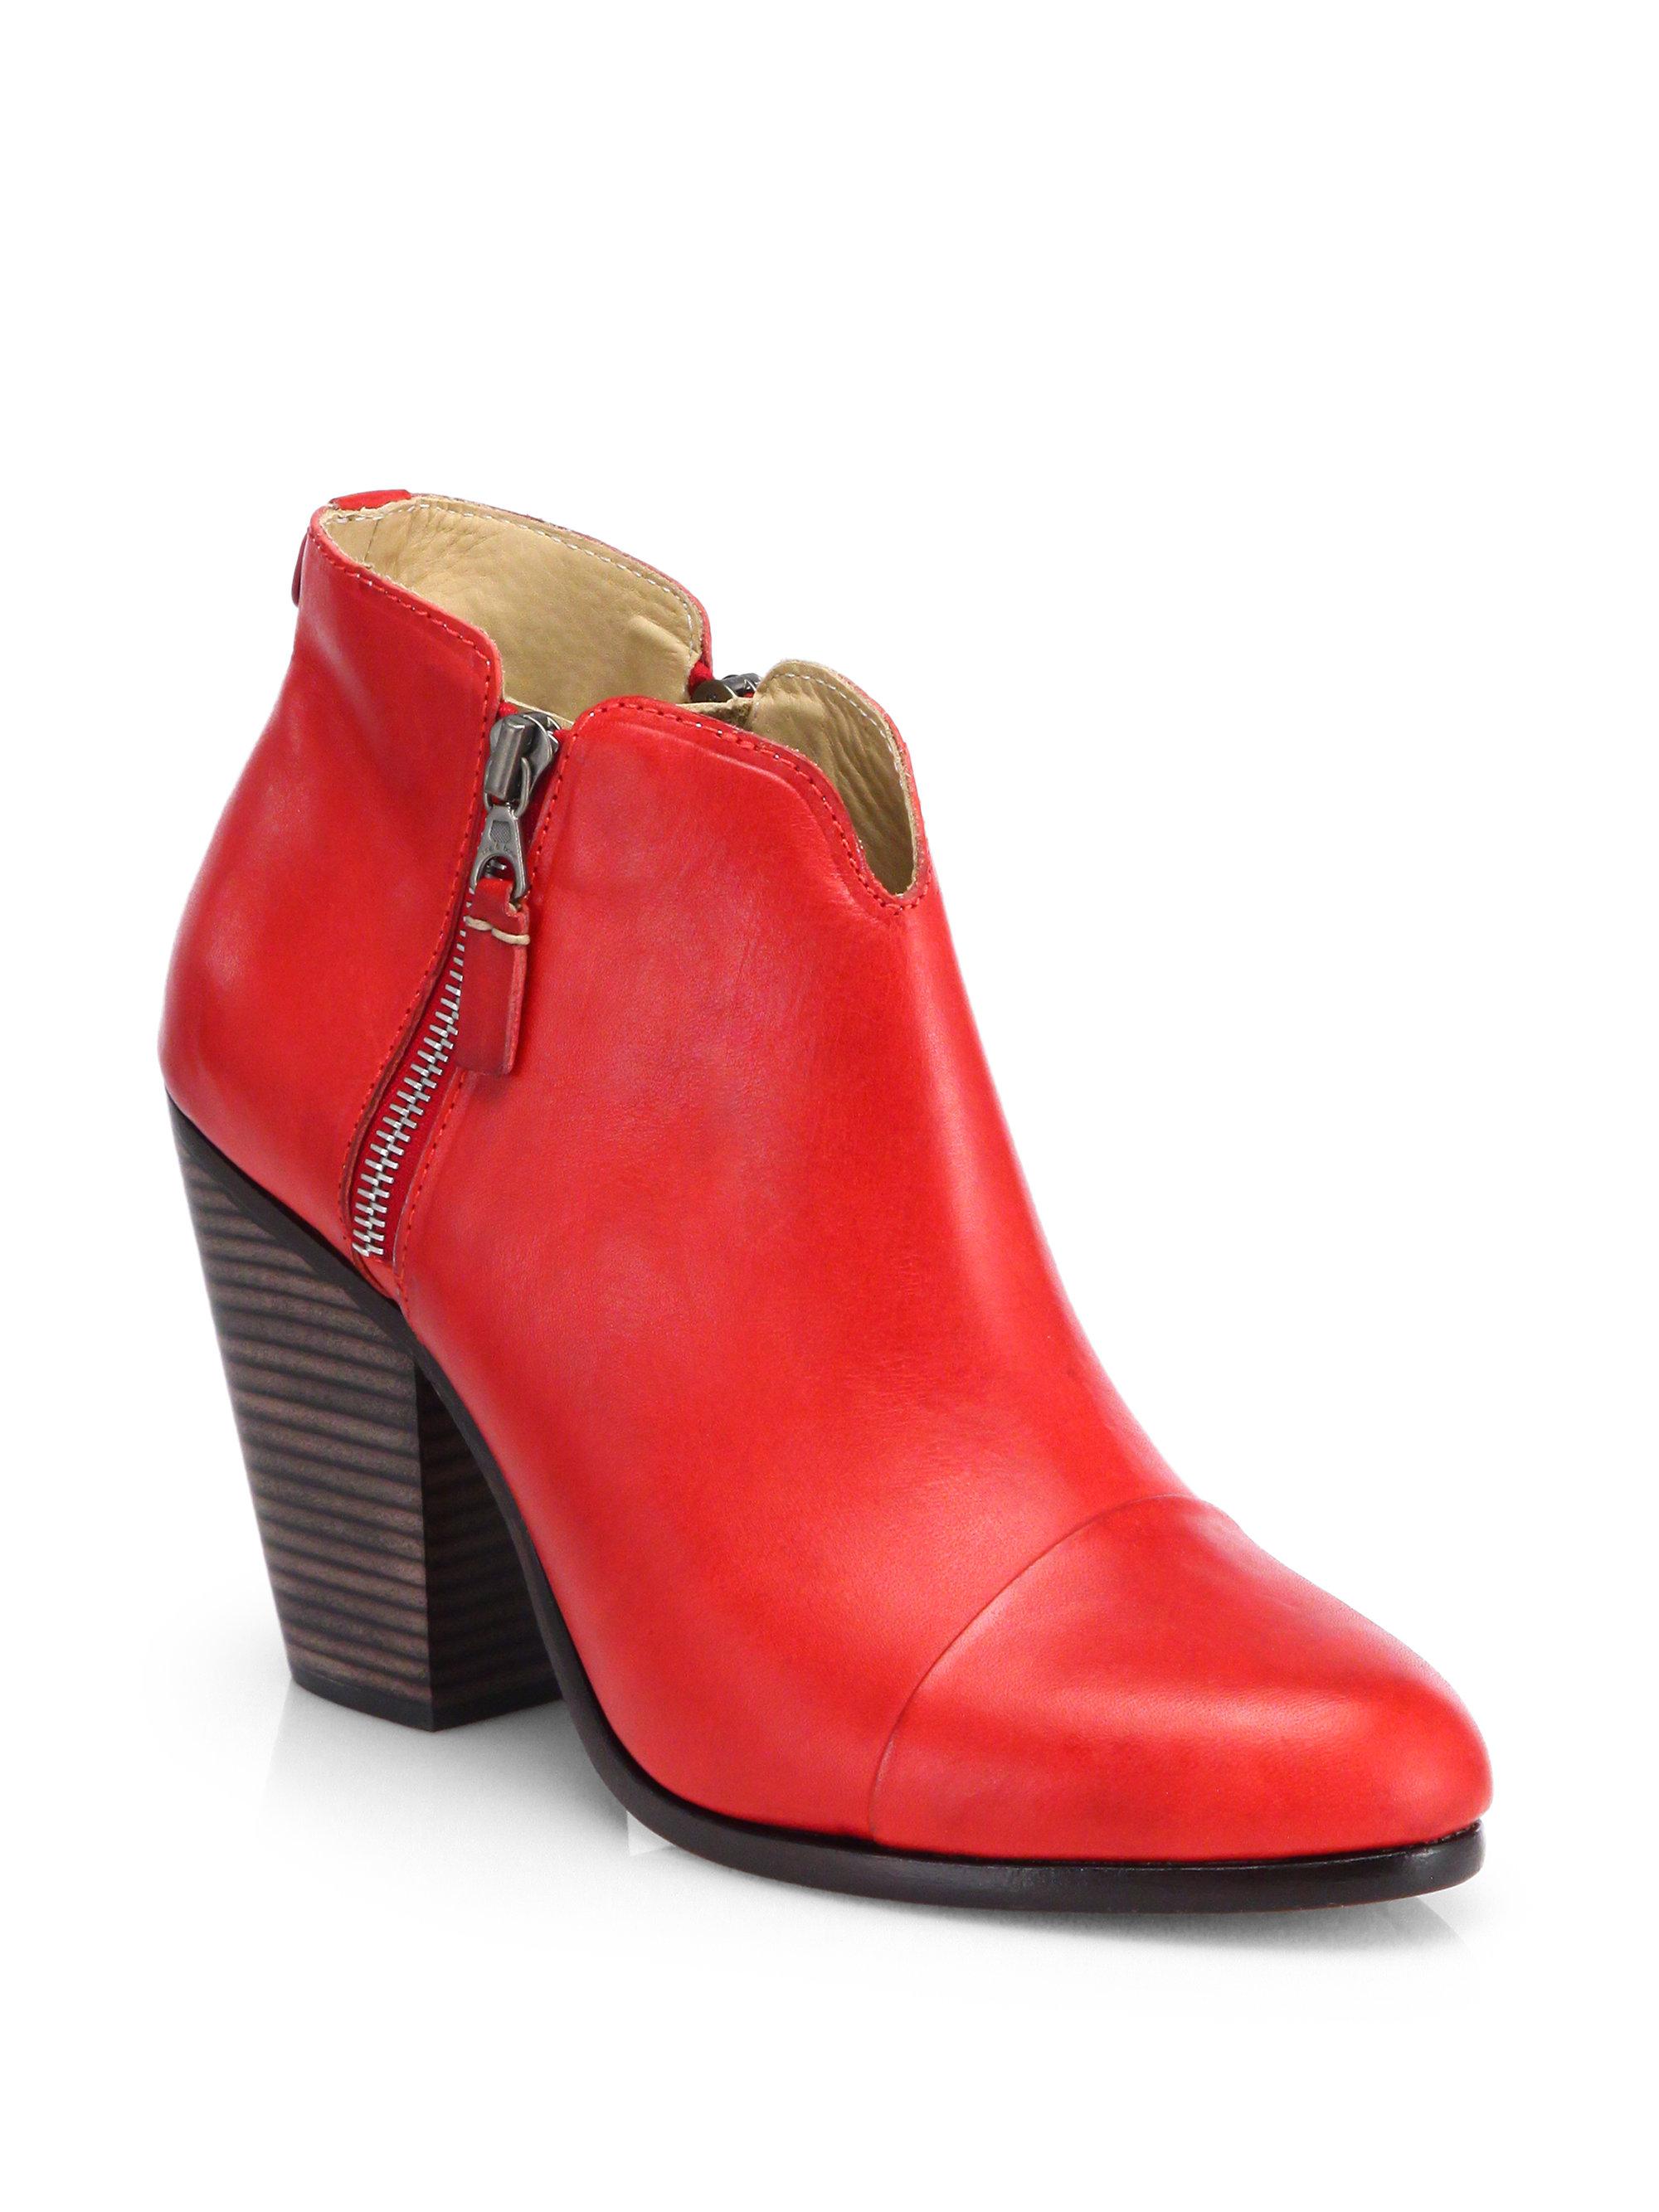 rag and bone boots sale